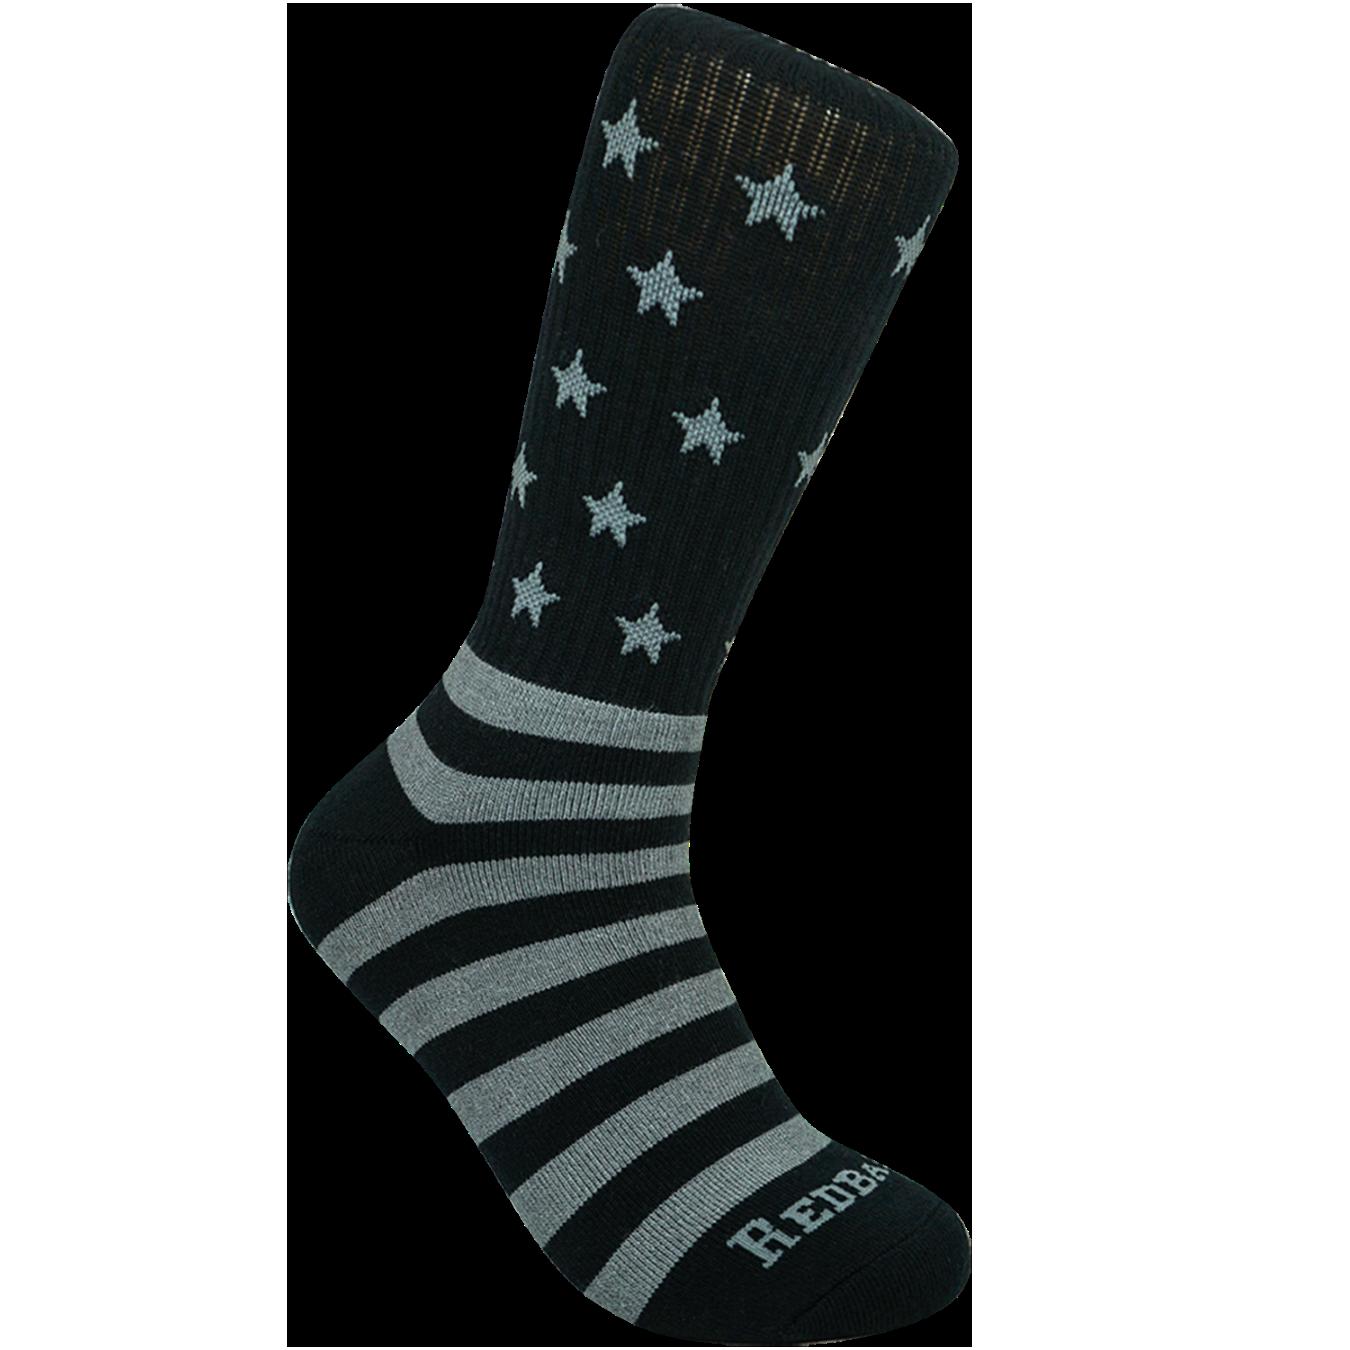 Redback Boots Black Bamboo Crew USA Flag Socks